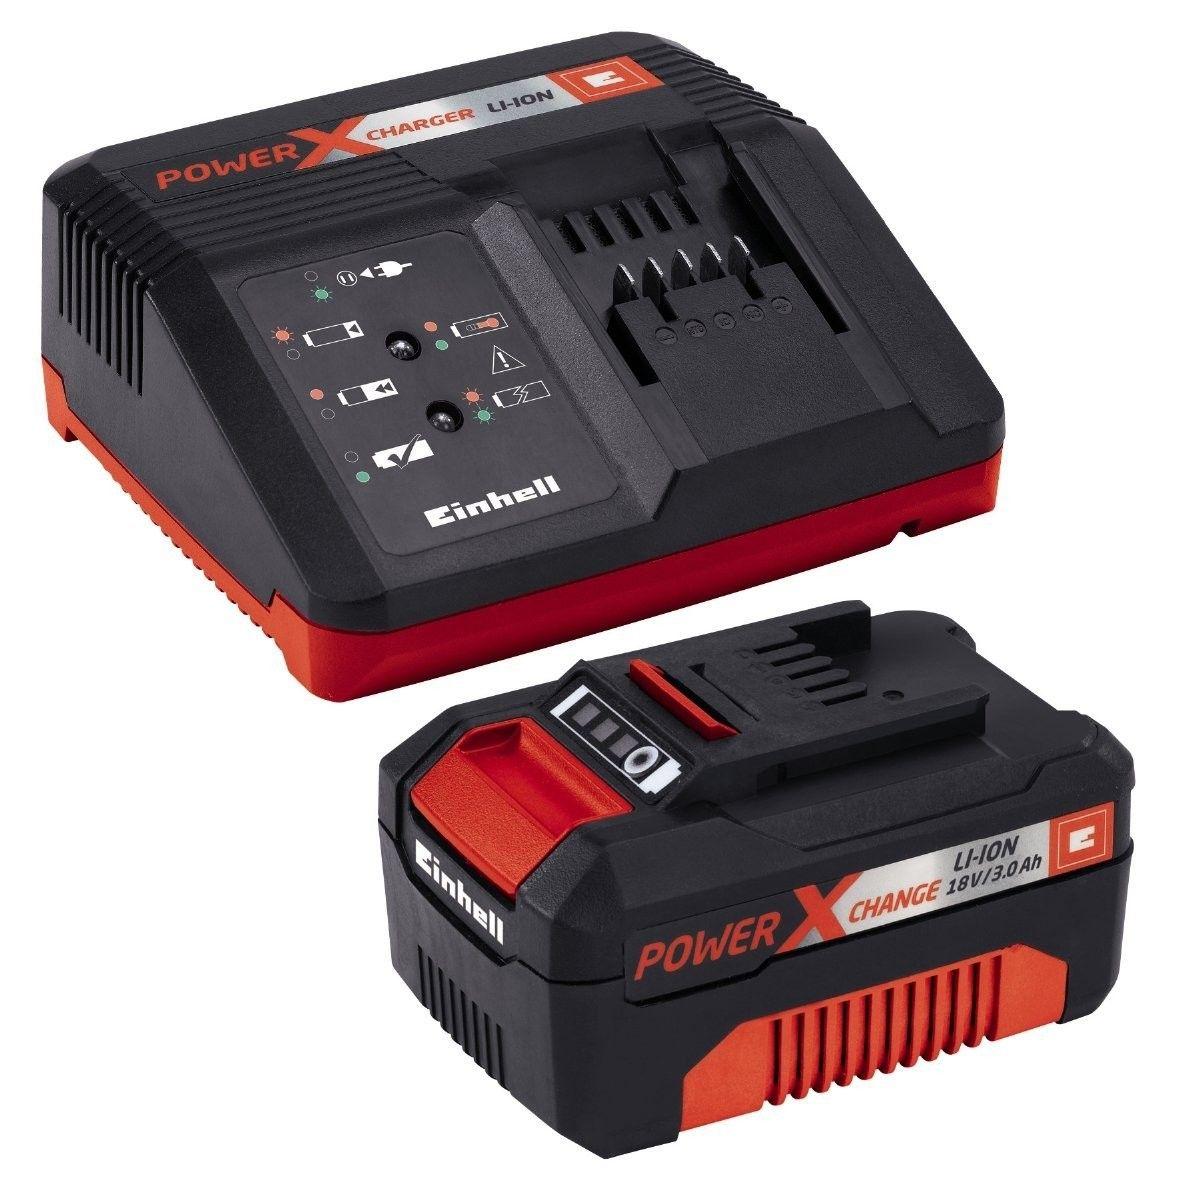 Elettrosega a Batteria GE-LC 18 LI EINHELL 4501760 con batteria 18V 3 Ah